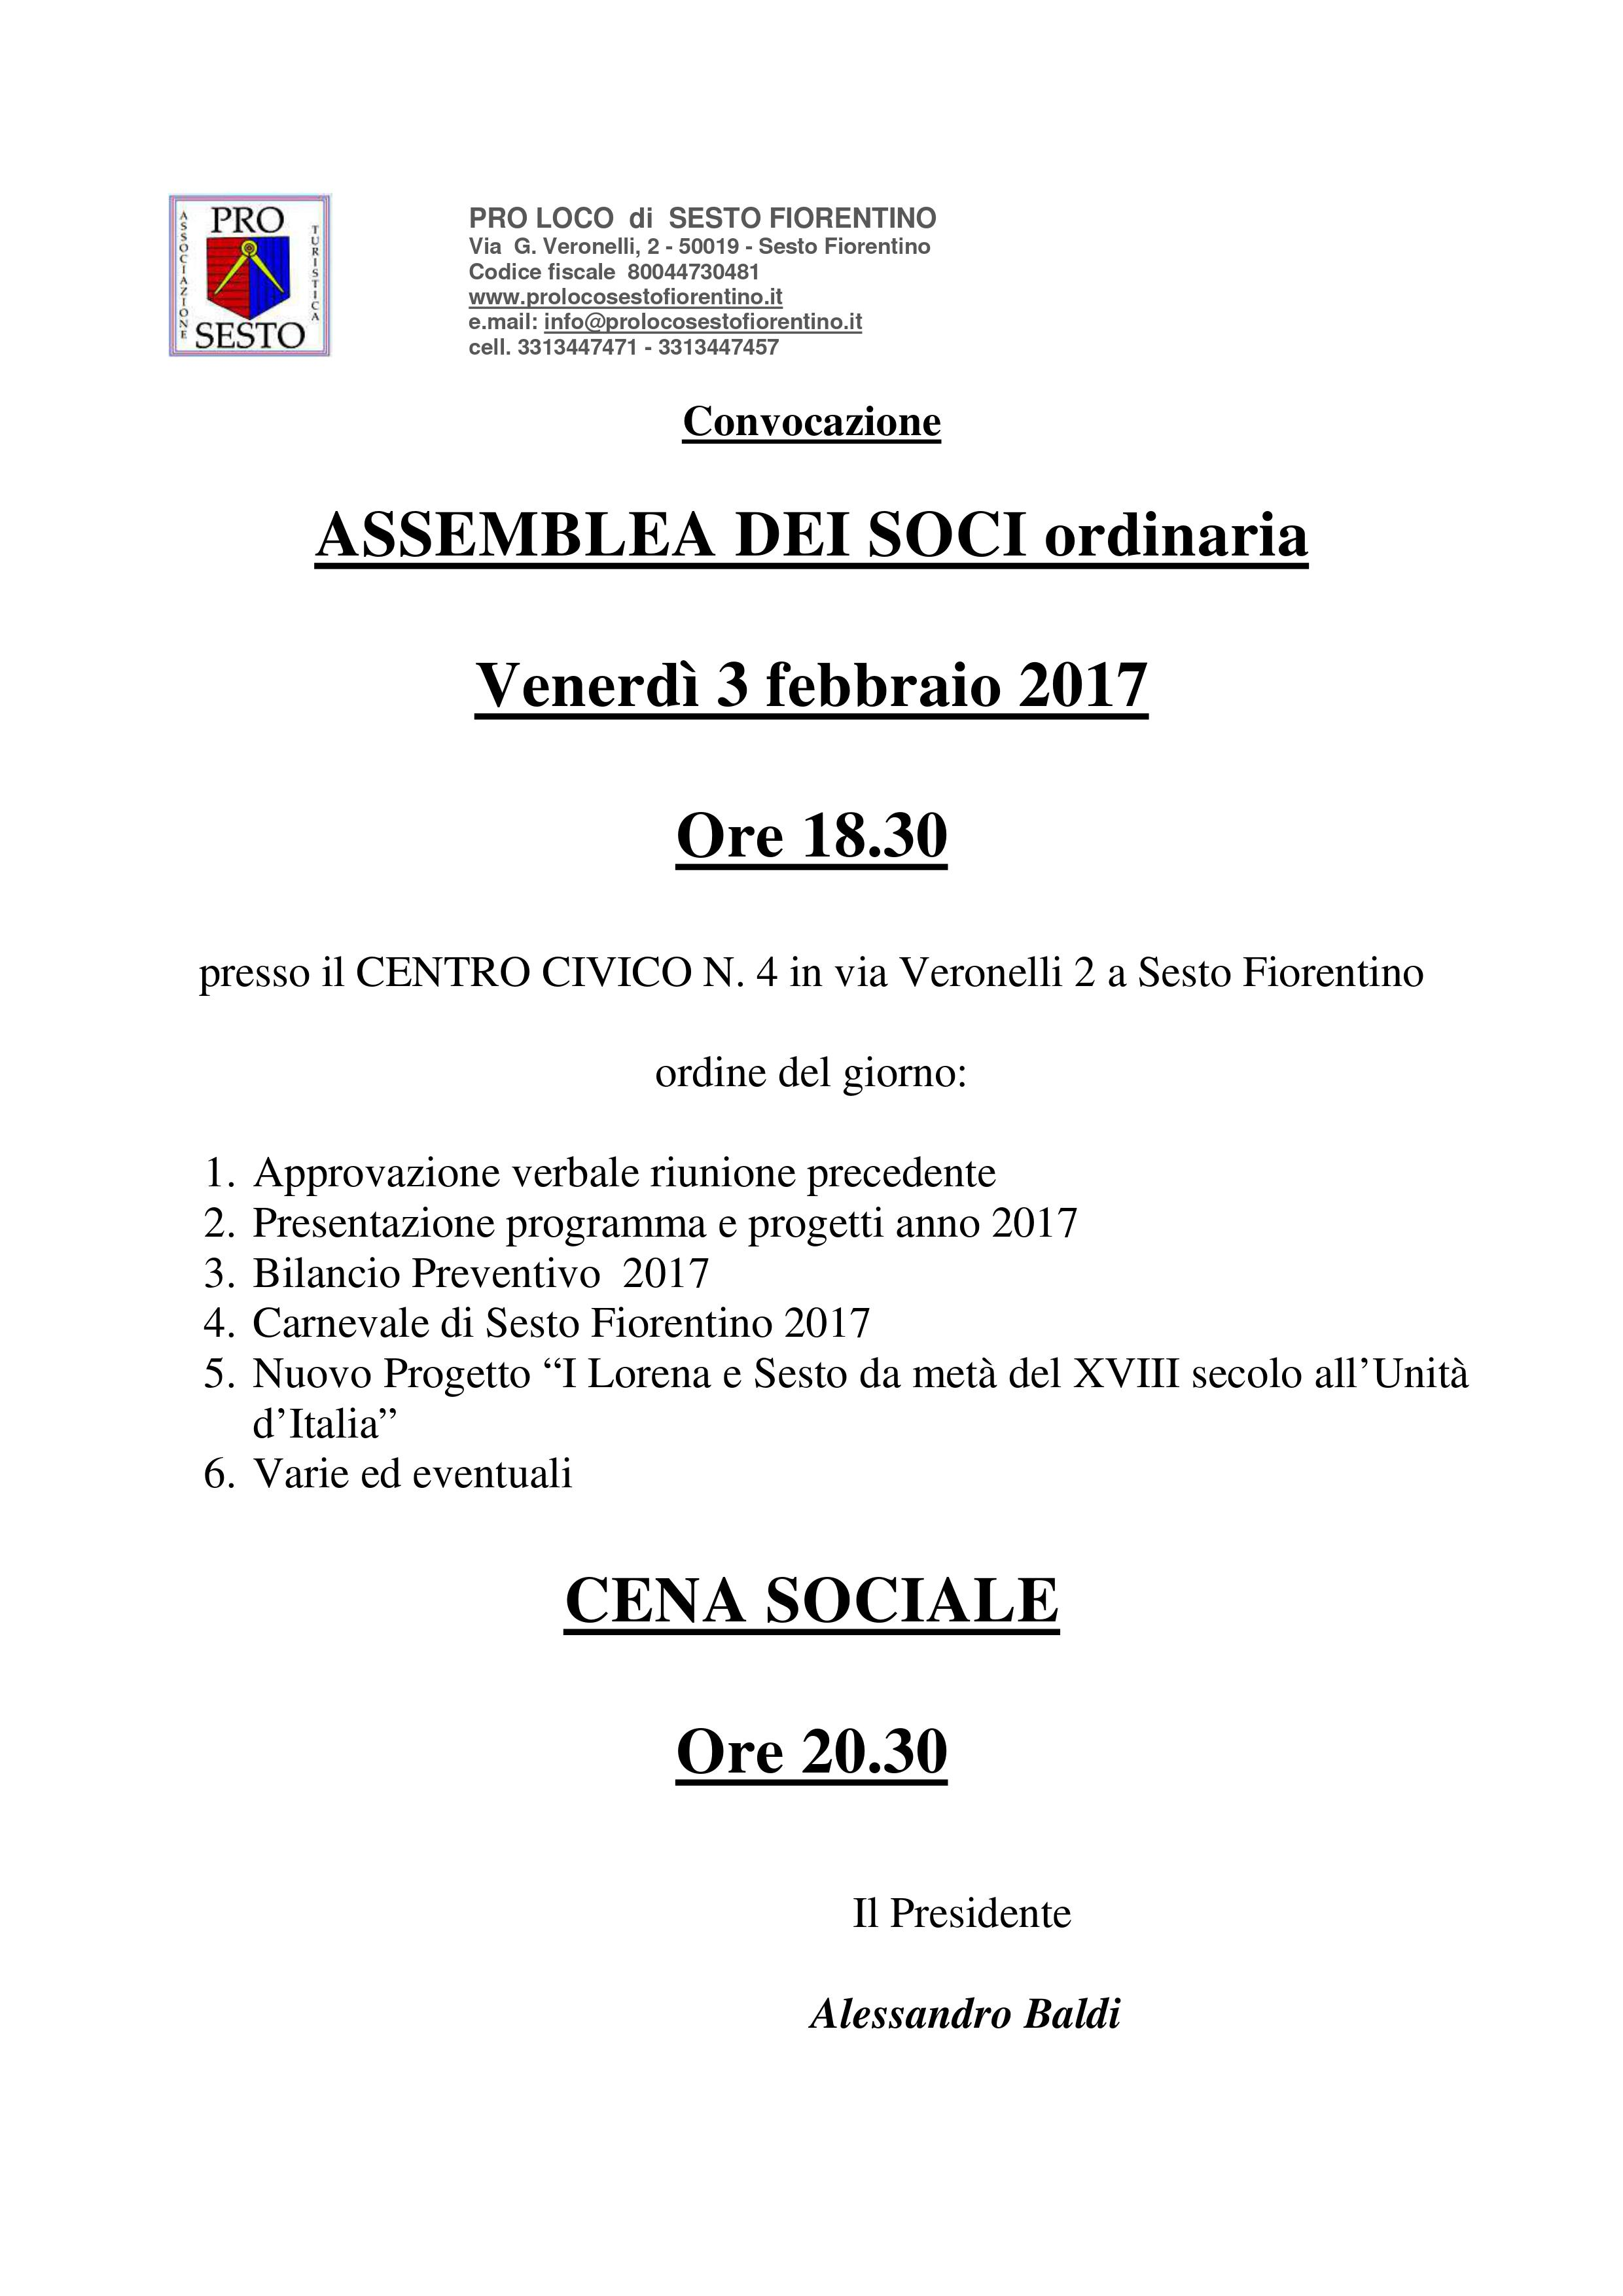 assemblea soci 2017.02 febb. locandina